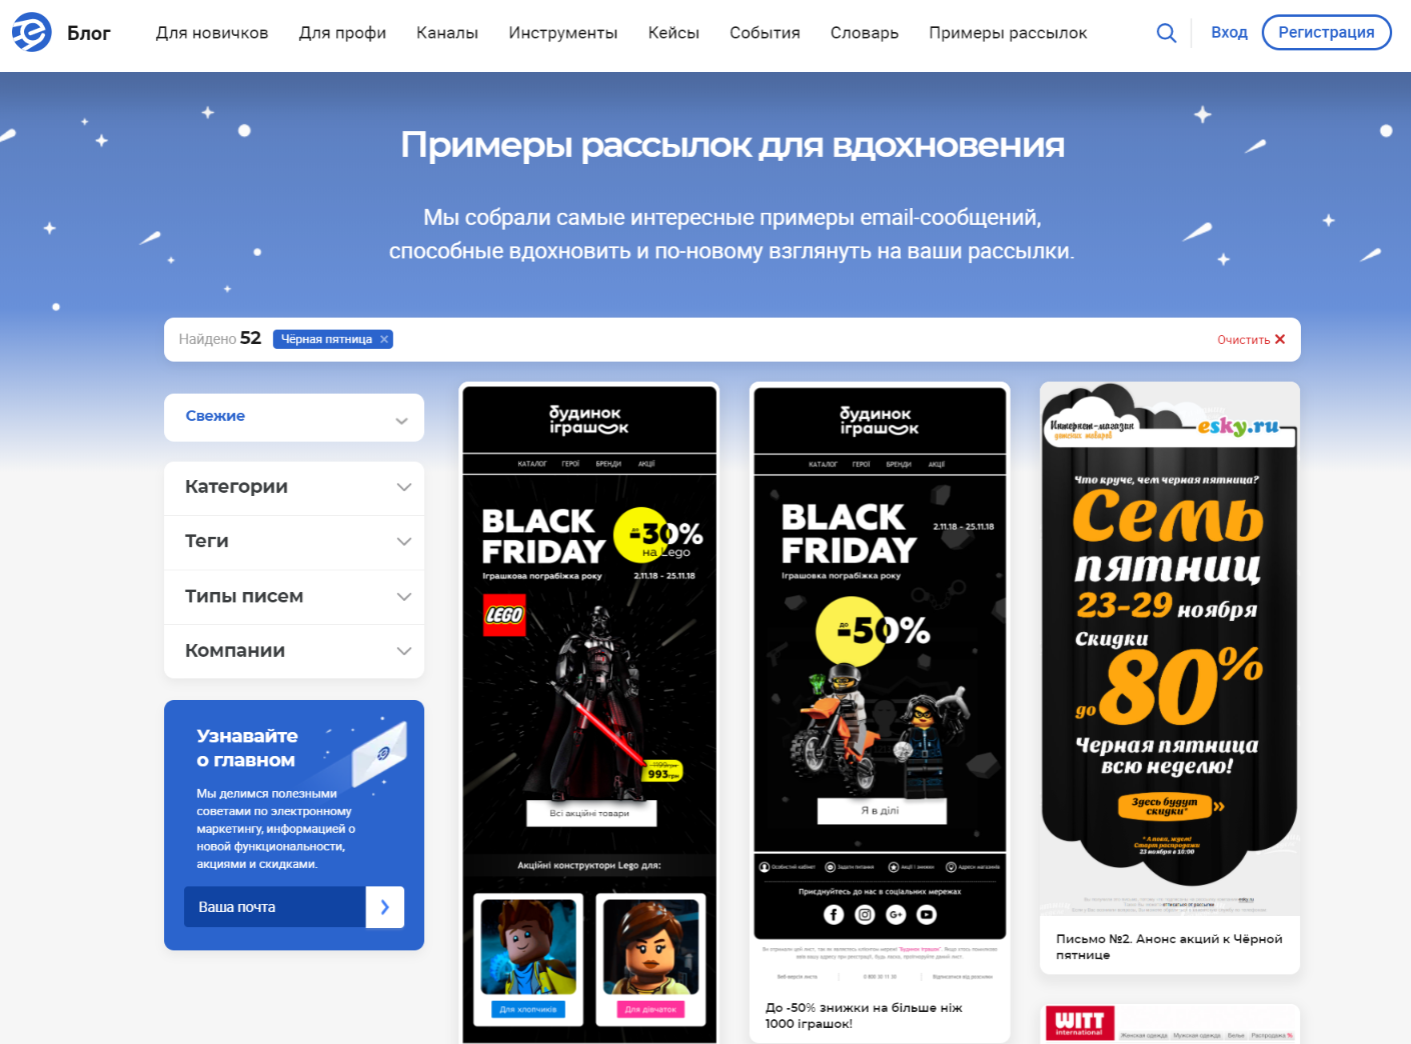 Листи Чорна п'ятниця в eSputnik